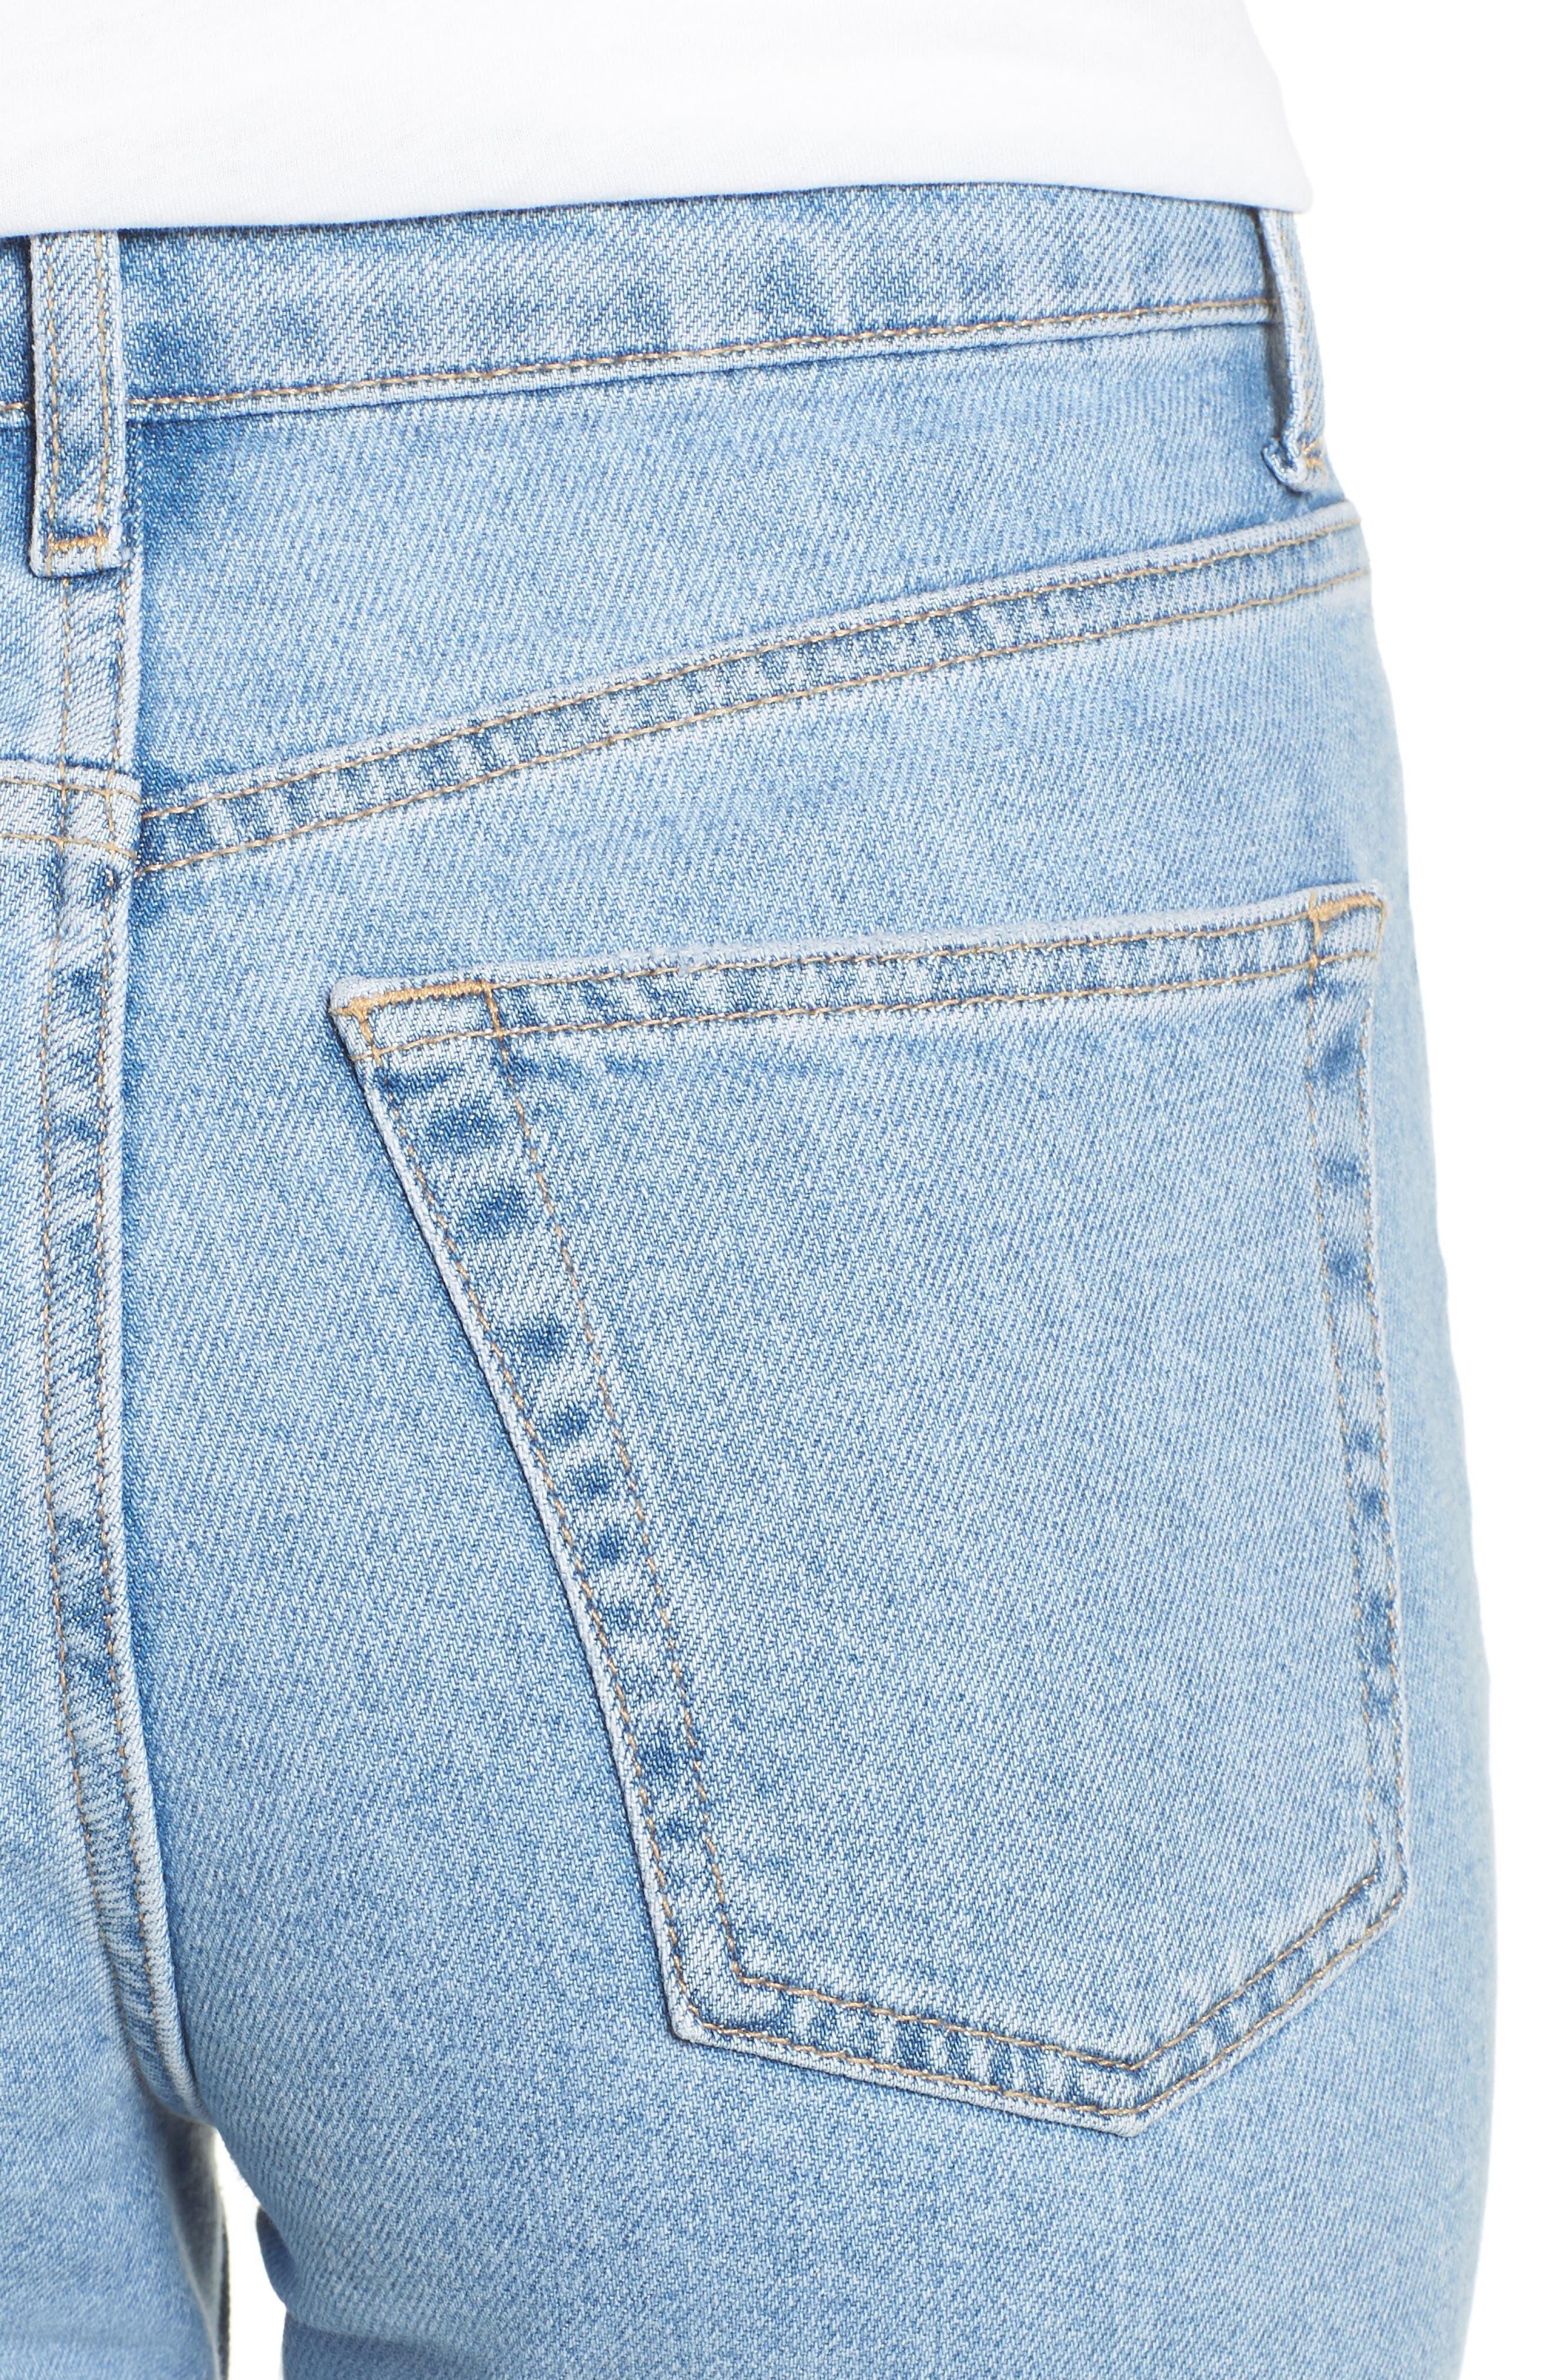 TOPSHOP, Raw Hem Straight Leg Jeans, Alternate thumbnail 5, color, BLEACH STONE DENIM